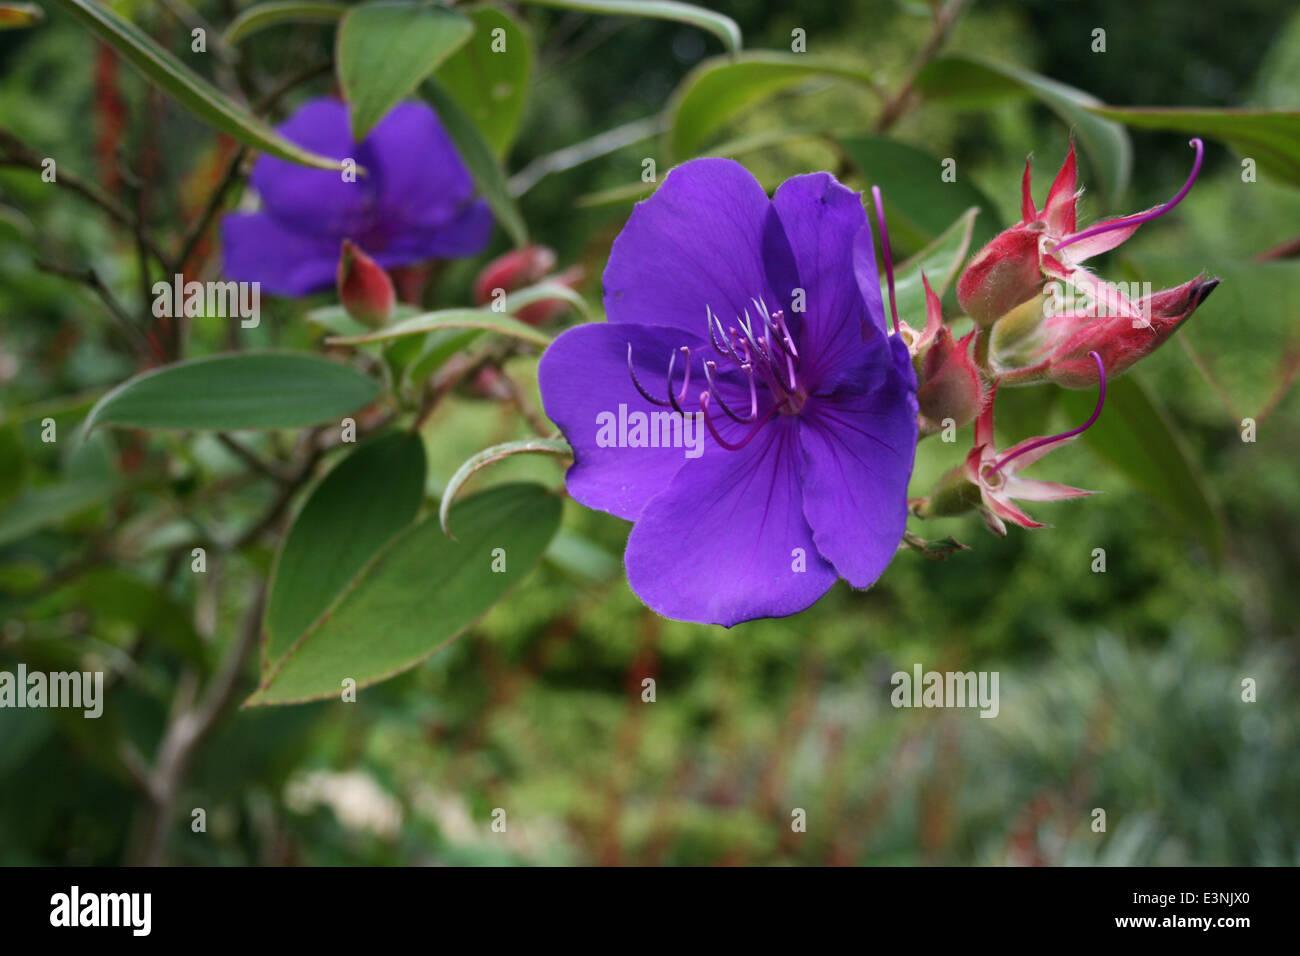 Prinzessinnenblume violett - Stock Image